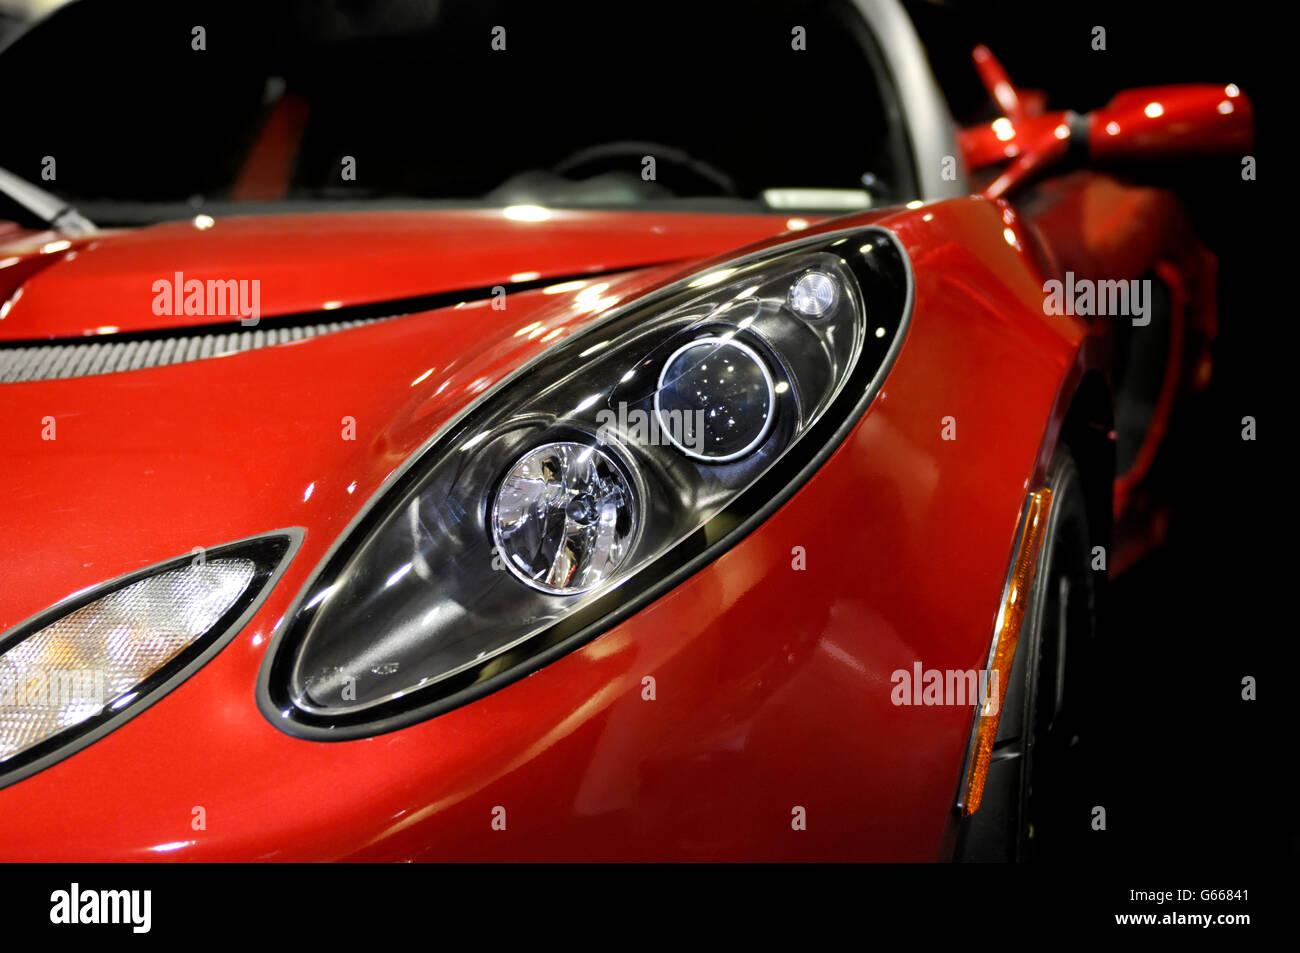 Closeup of 2008 red Lotus Elise sports car headlight - Stock Image